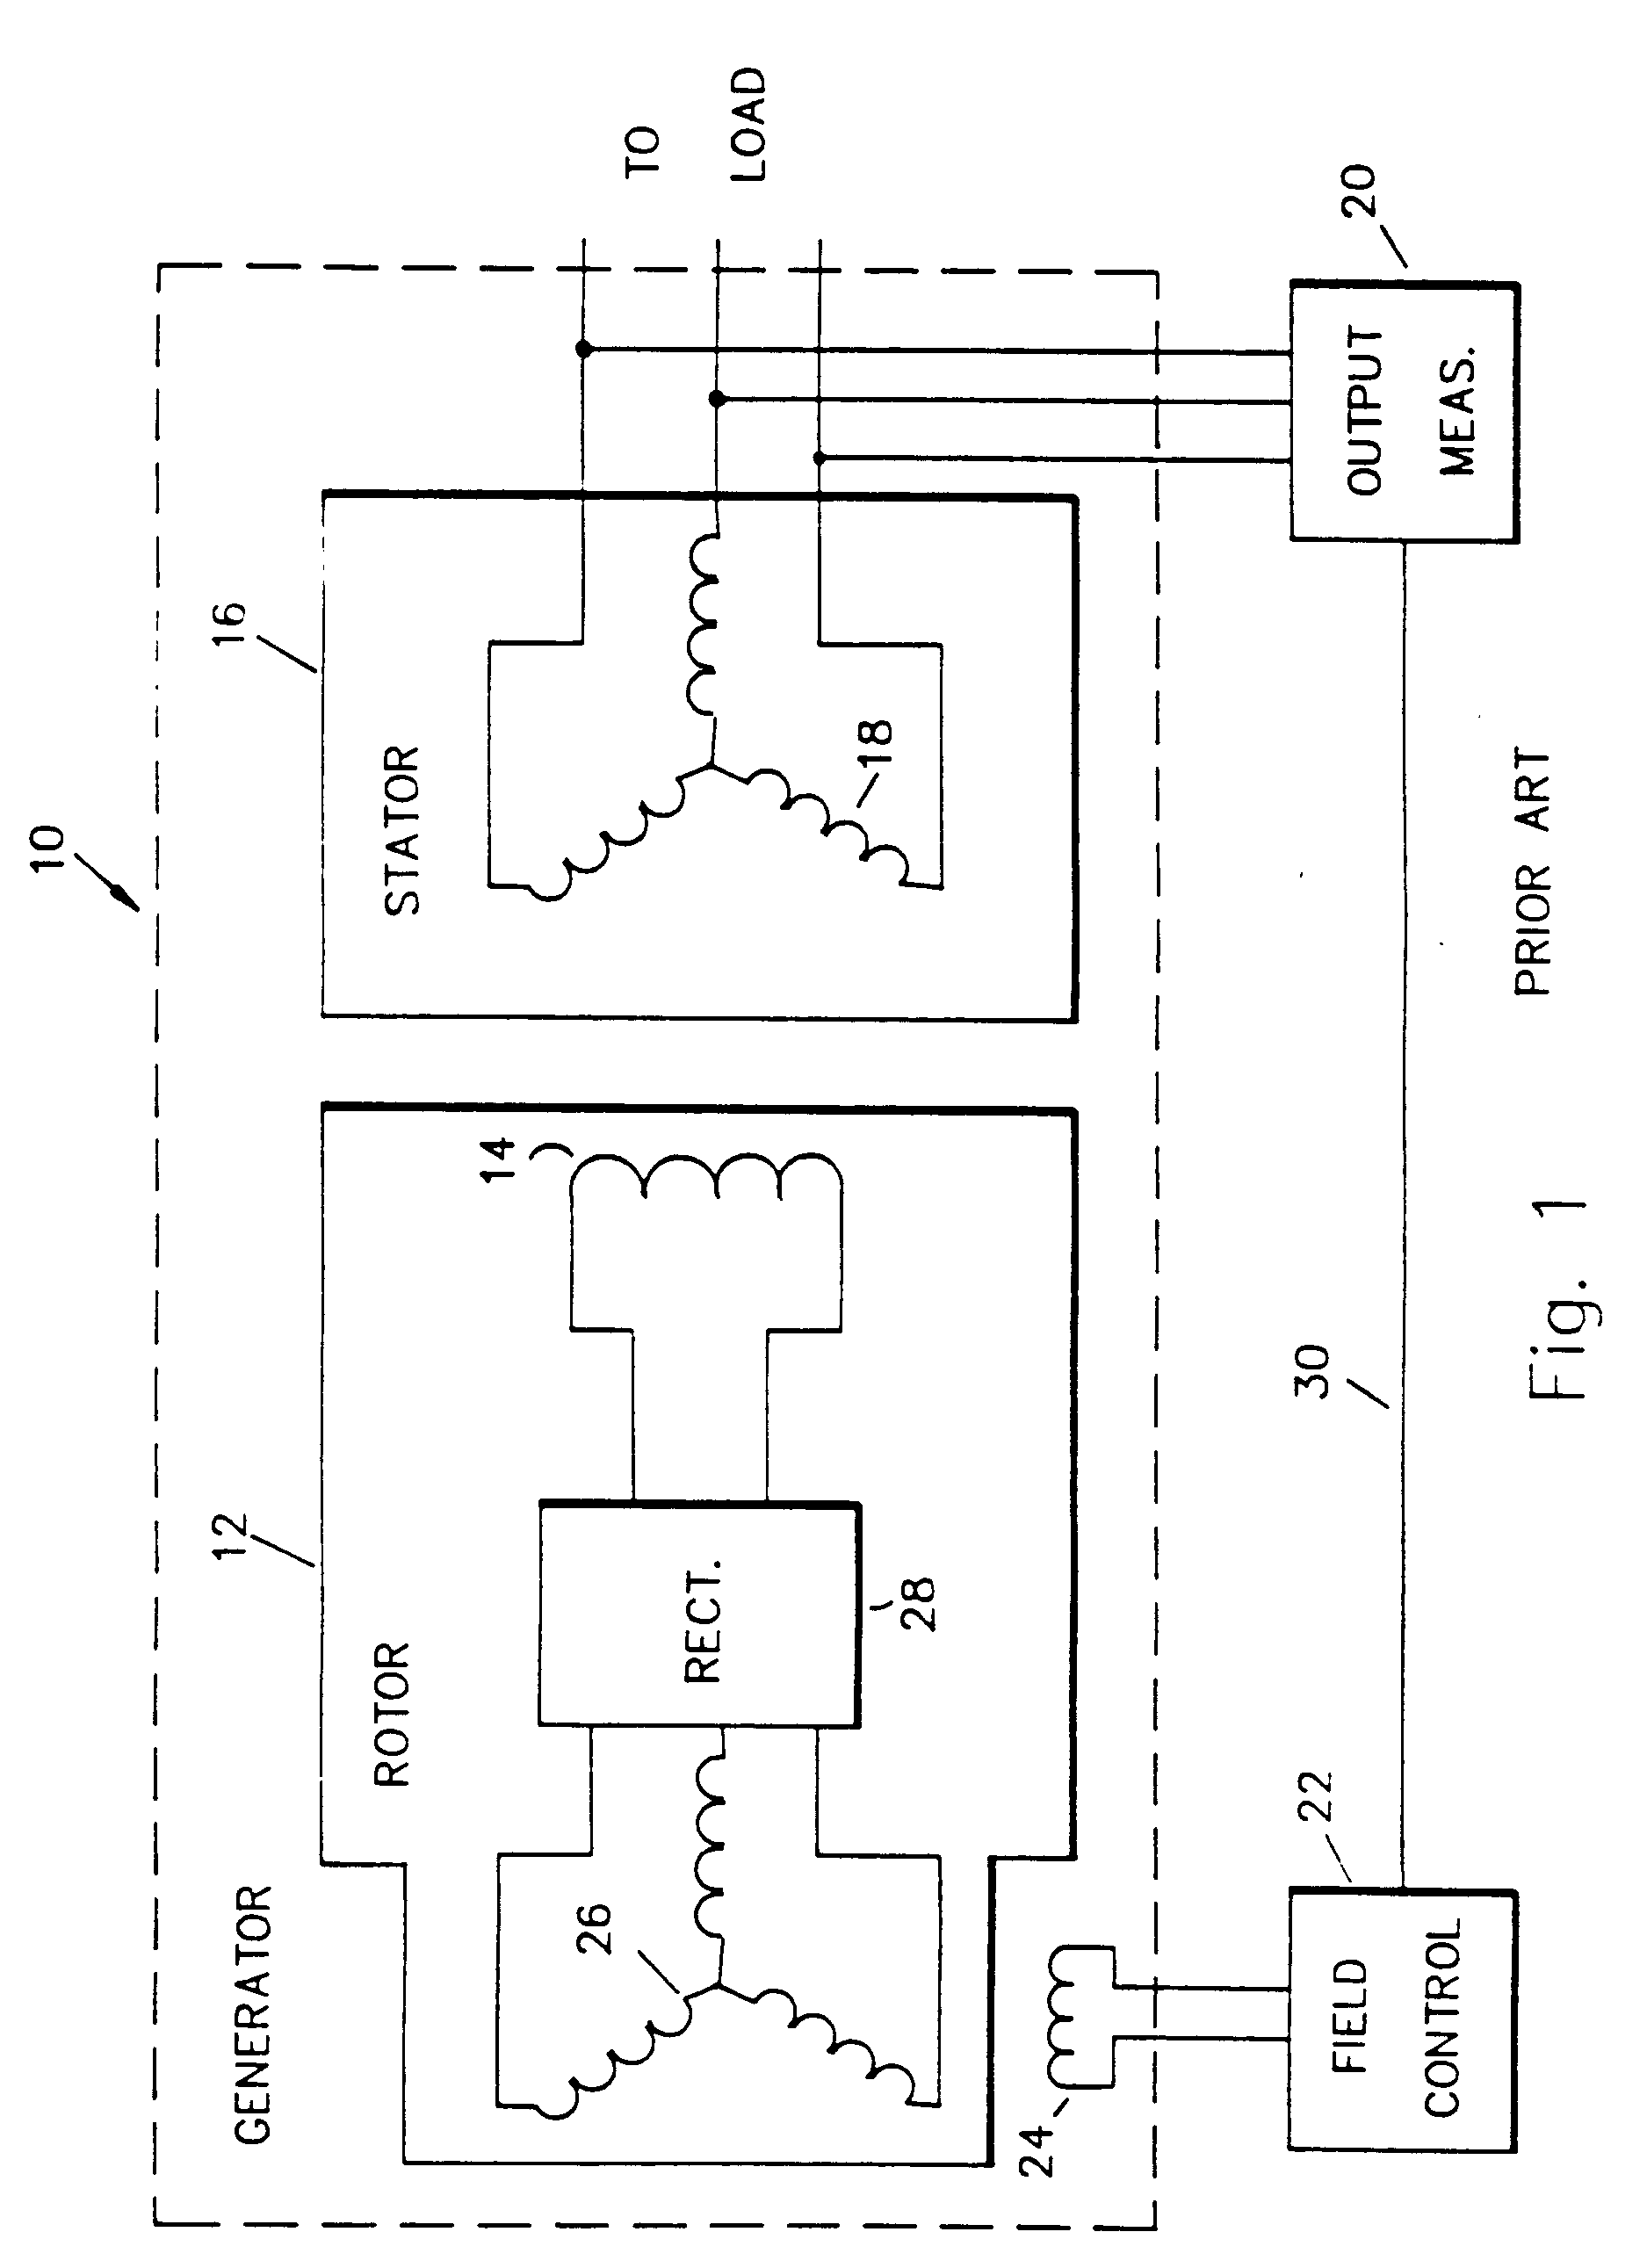 Generator Exciter Wiring Diagram : Patent ep b brushless generator exciter using